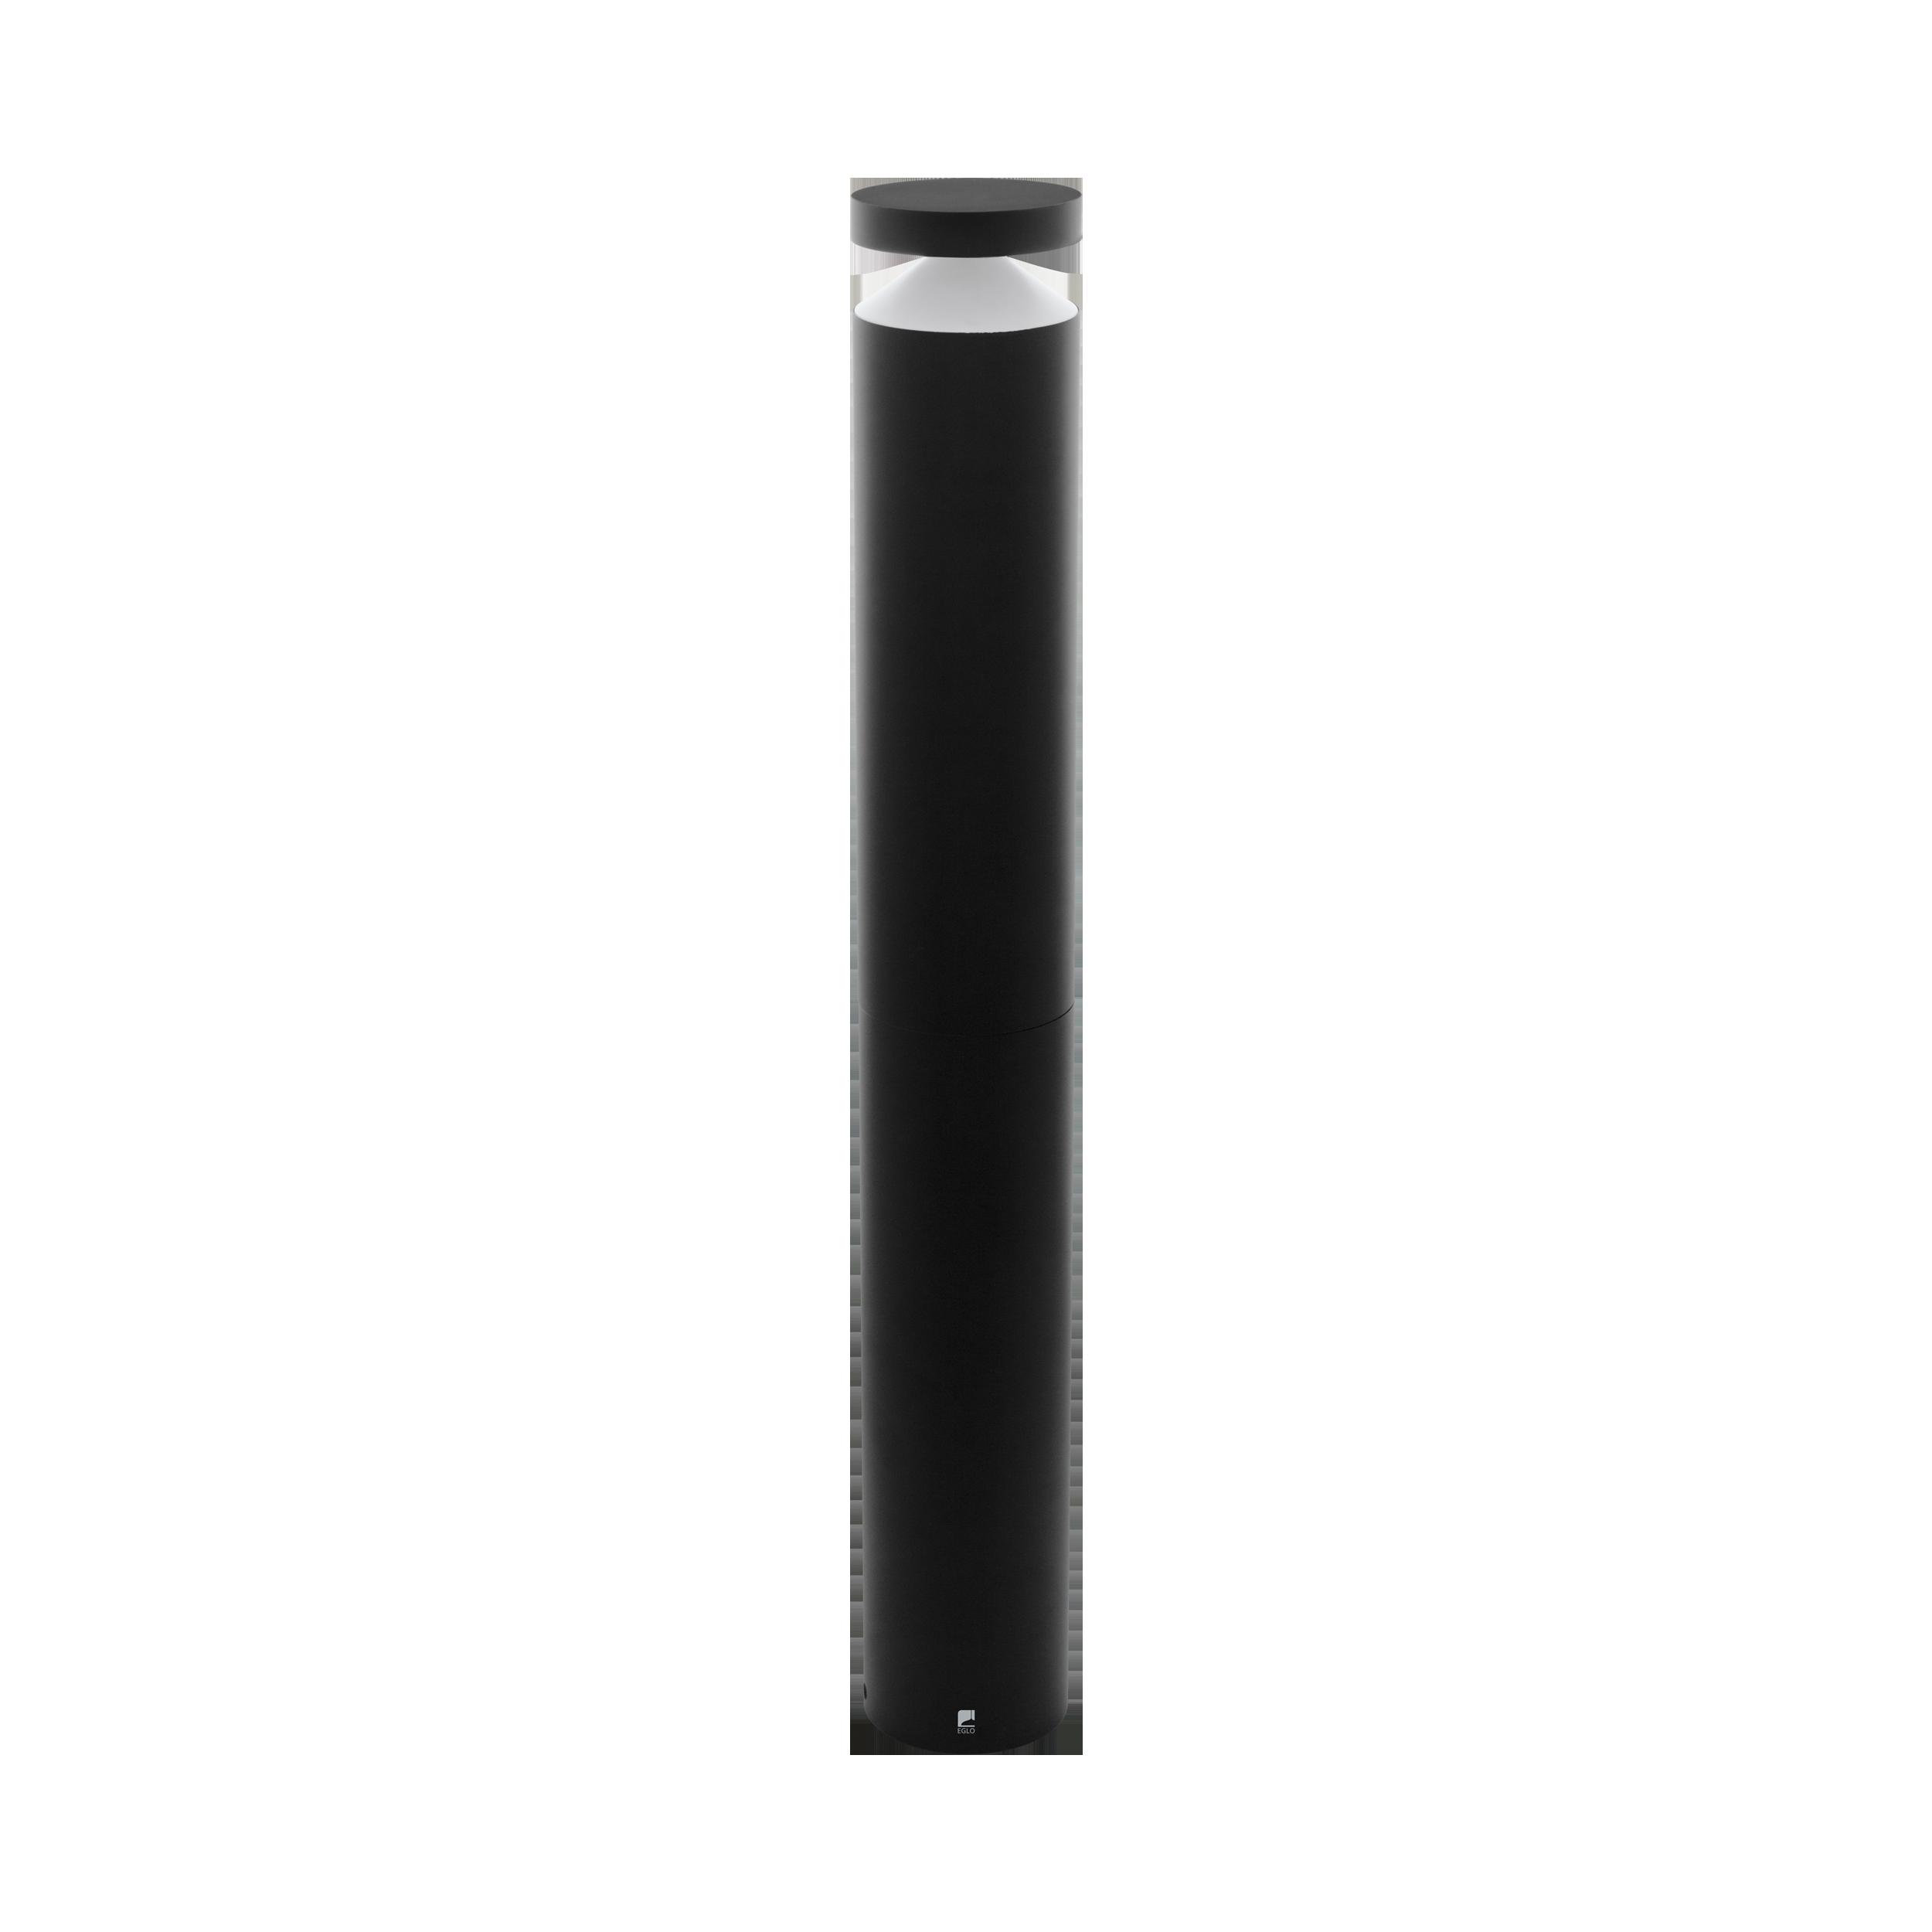 MELZO 11W LED 950lm 3000K IP44 must alumiinium raam